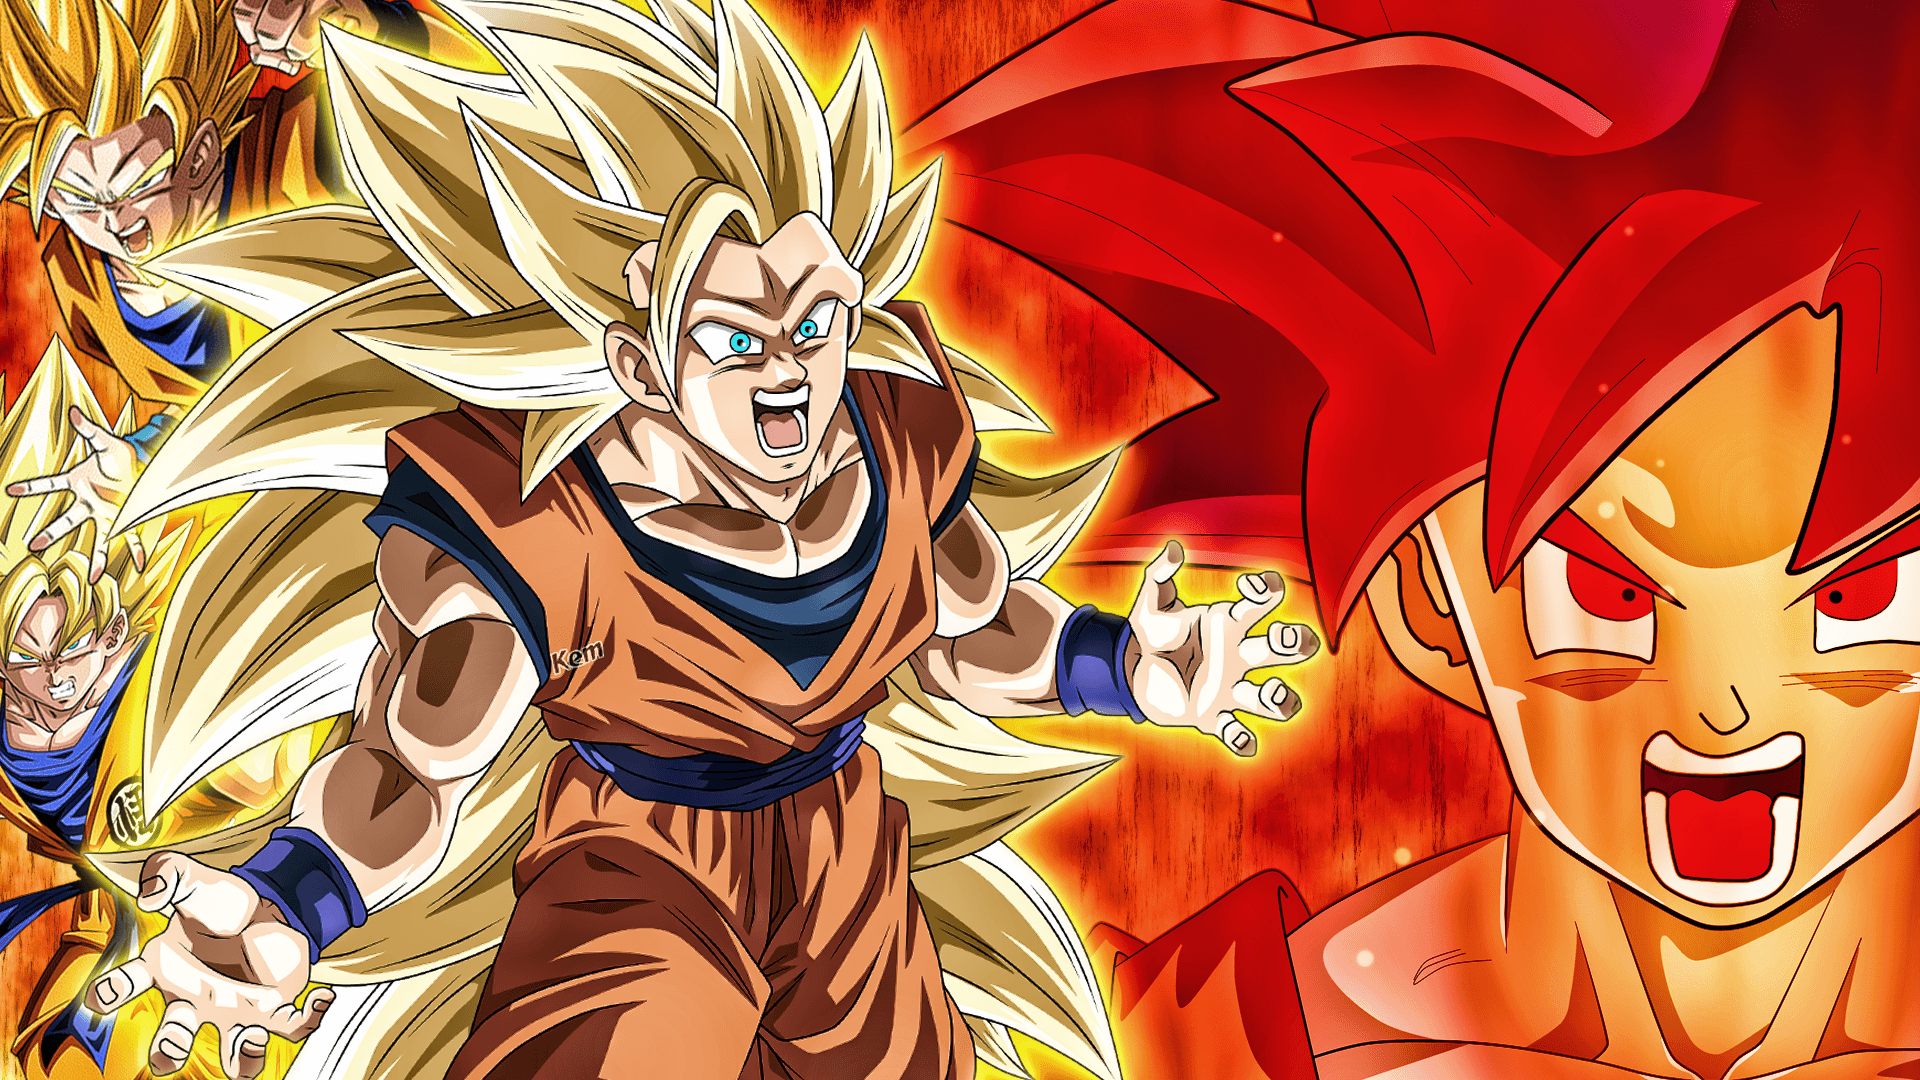 ... Goku vs Buu Wallpaper by Billysan291